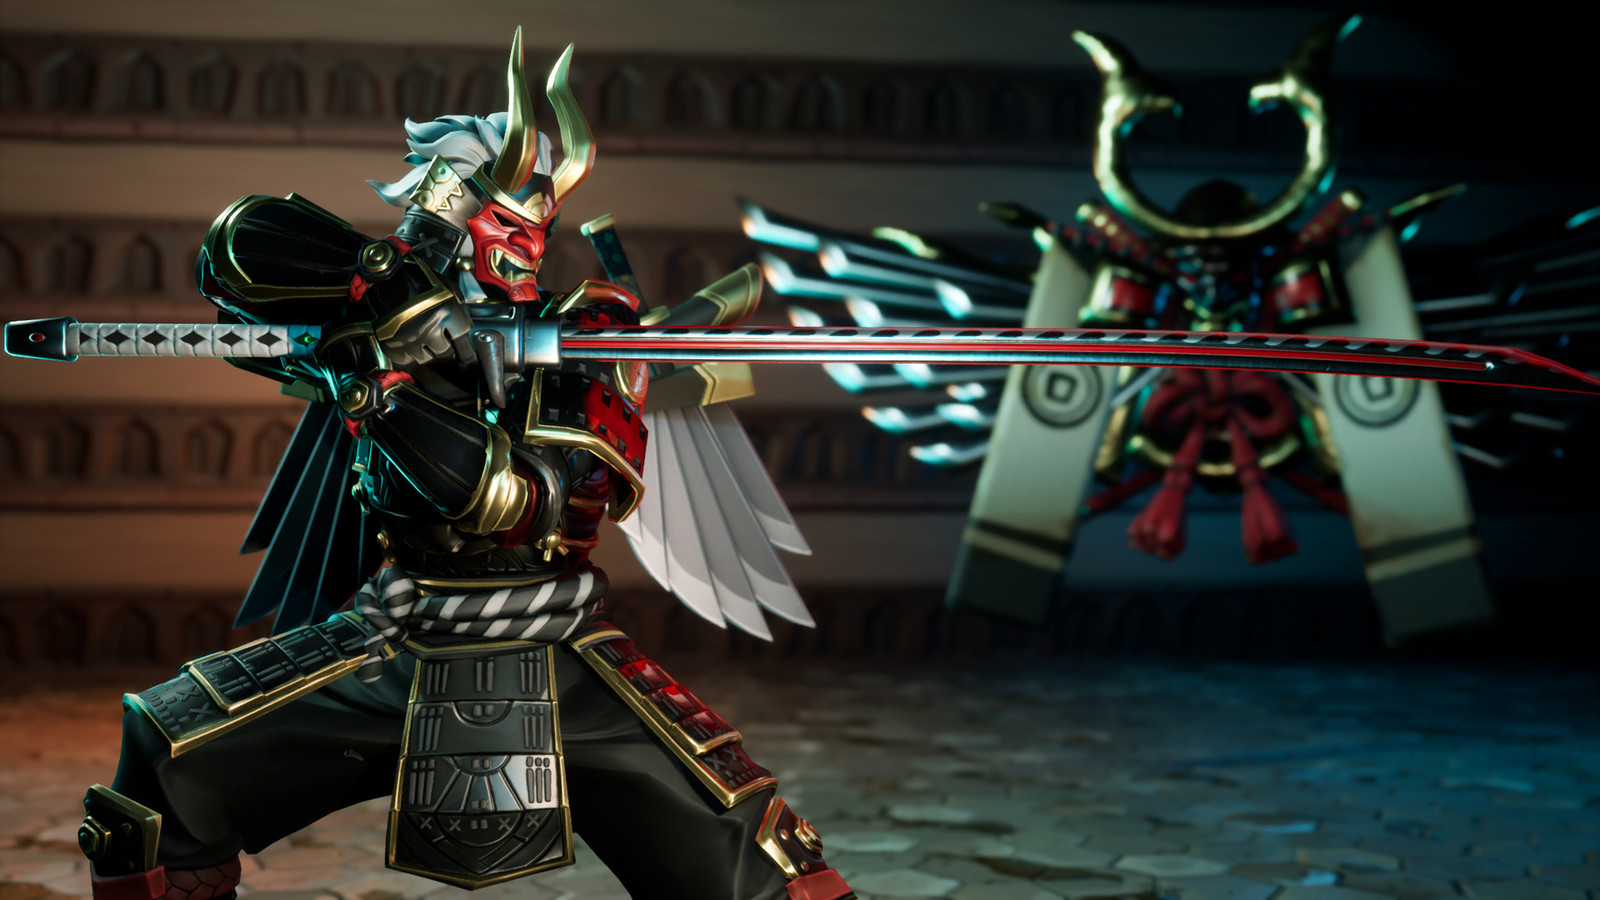 shogun fortnite battle royale z5011jpg 1600x900